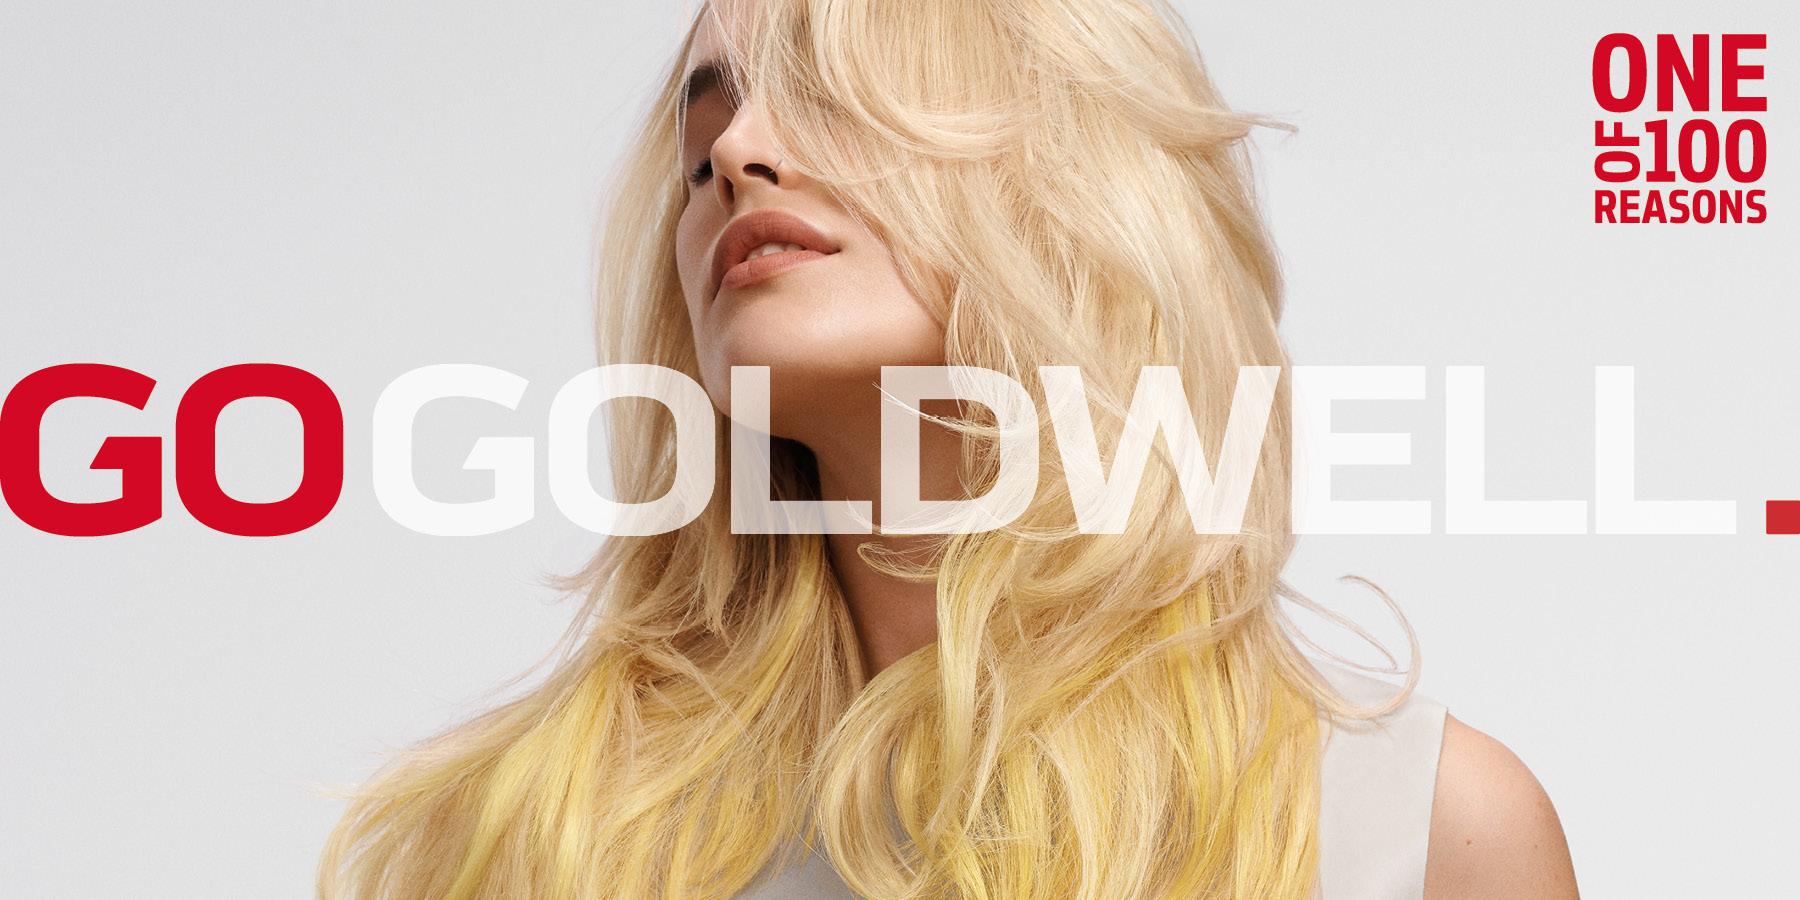 GW-MB-GOGOLDWELL-Home-Fullscreen-Teaser-2